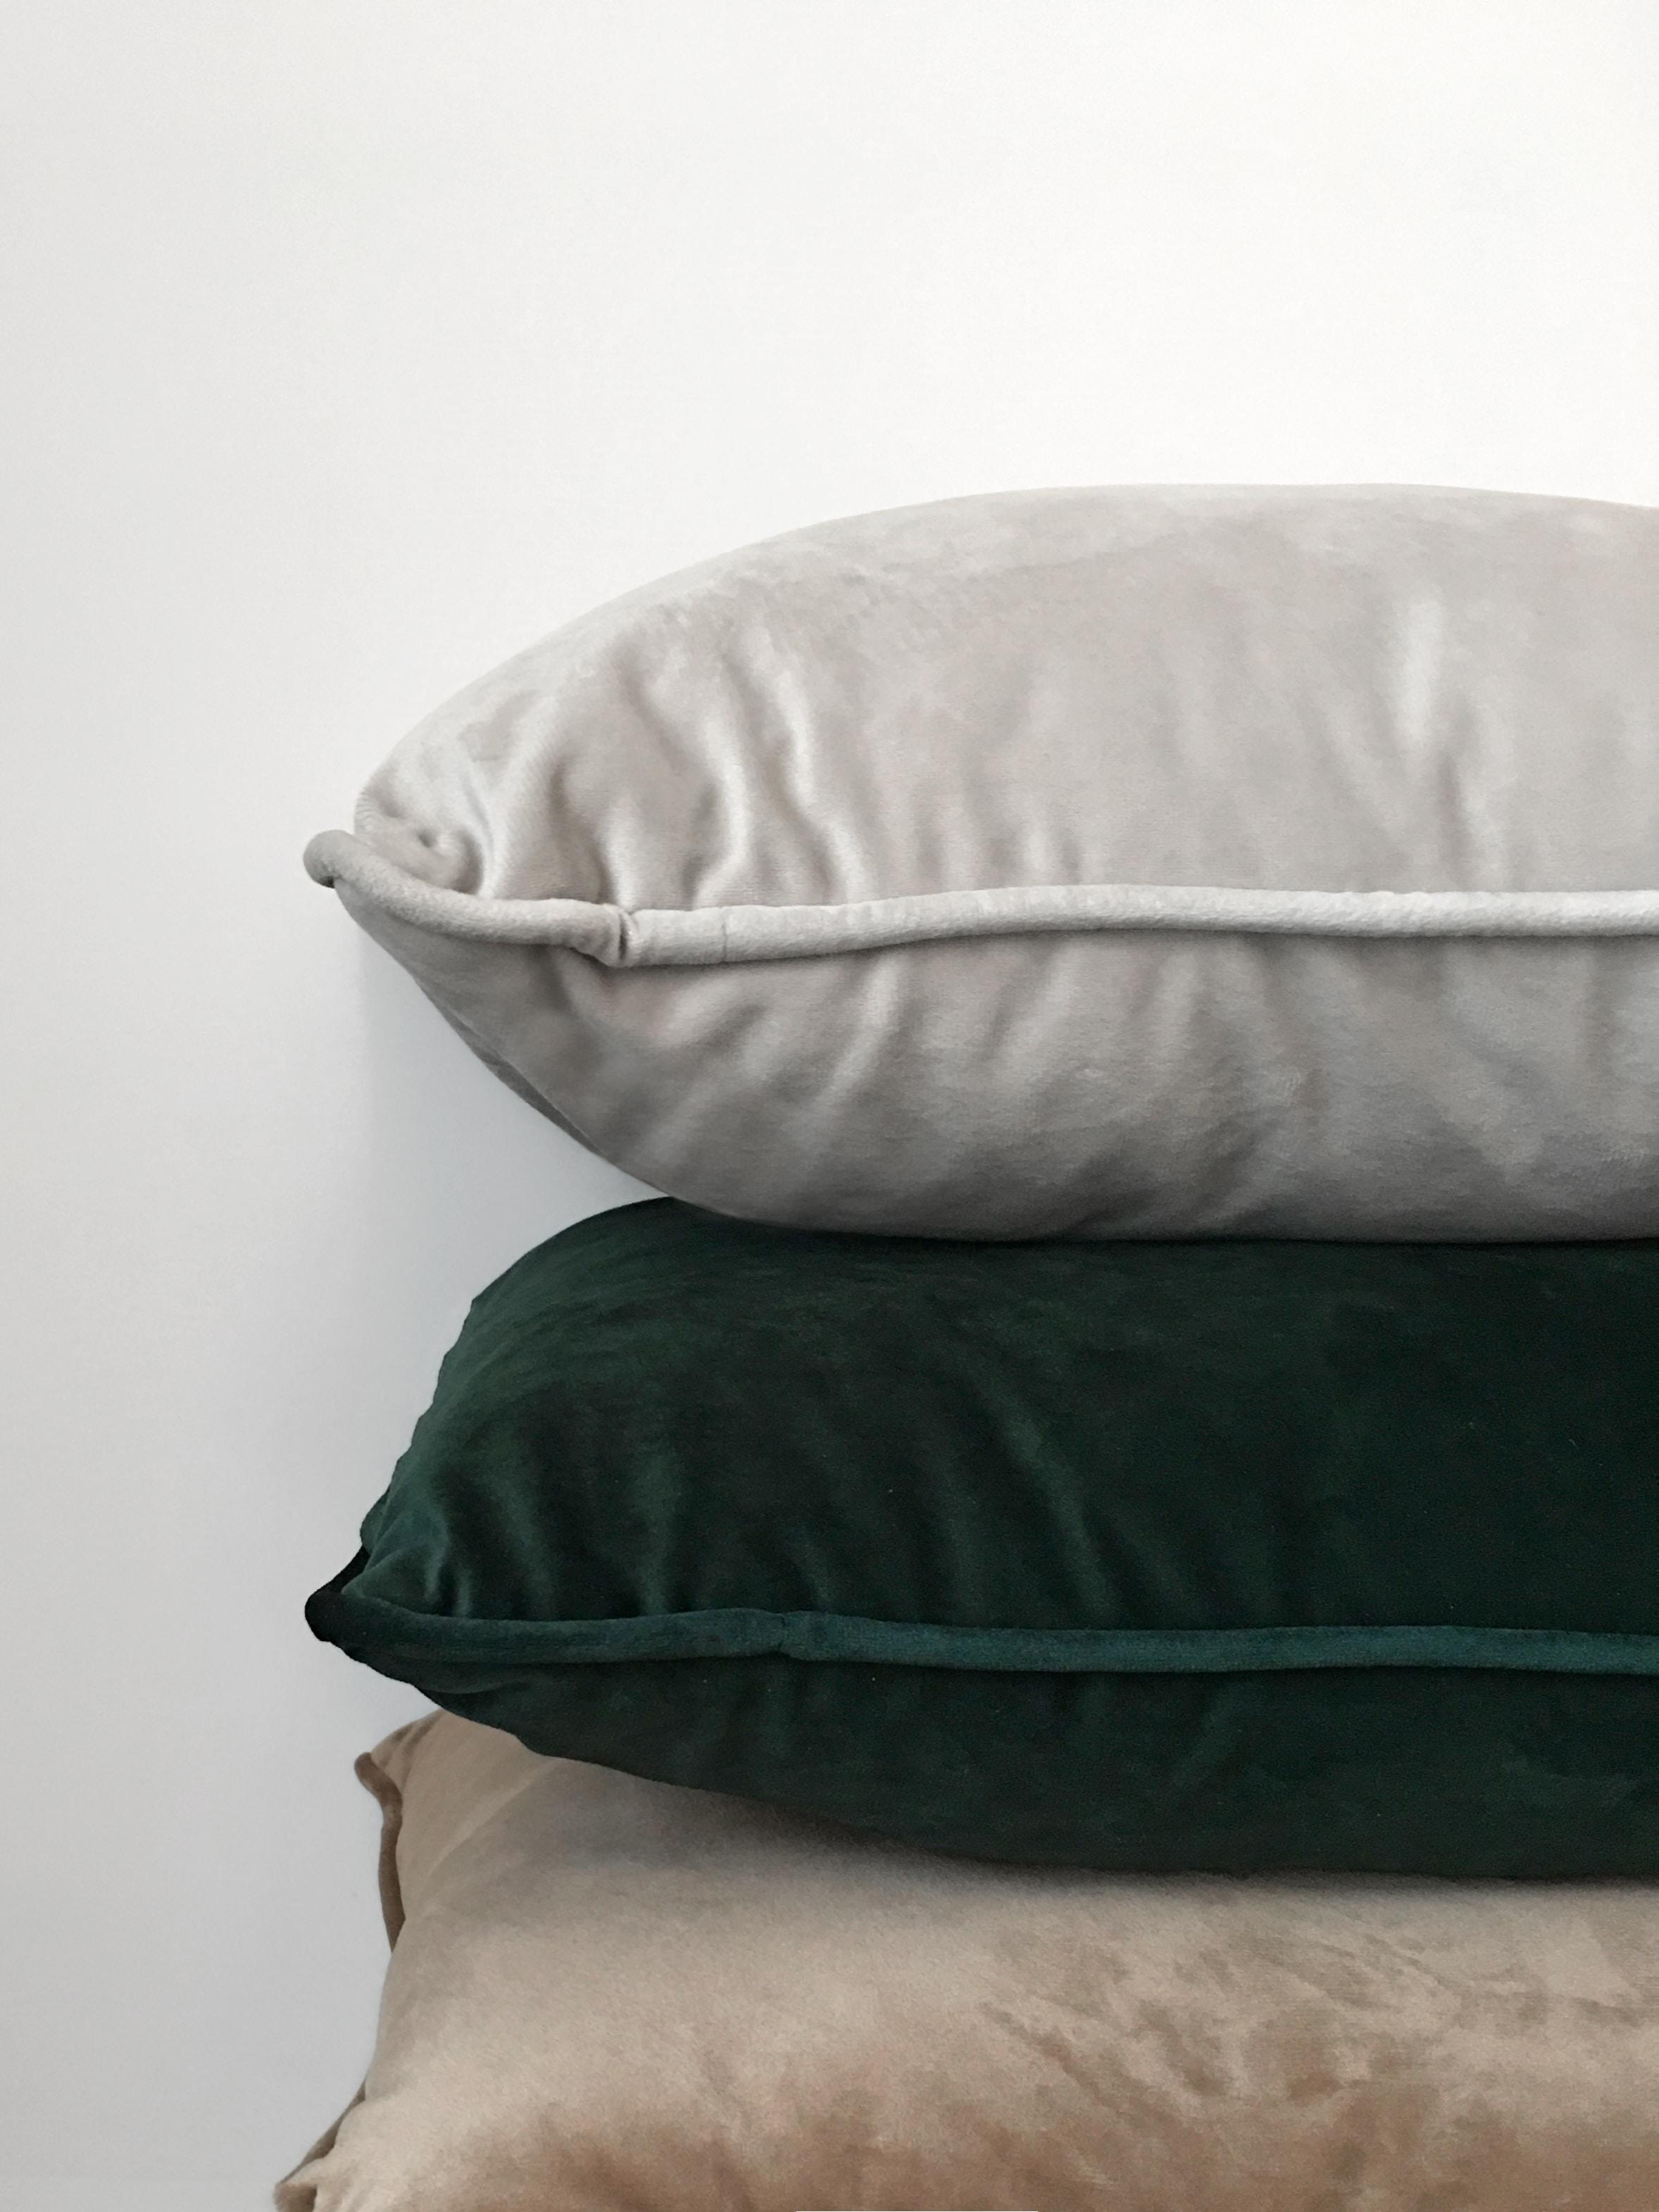 cooling gel pillow downtown toronto